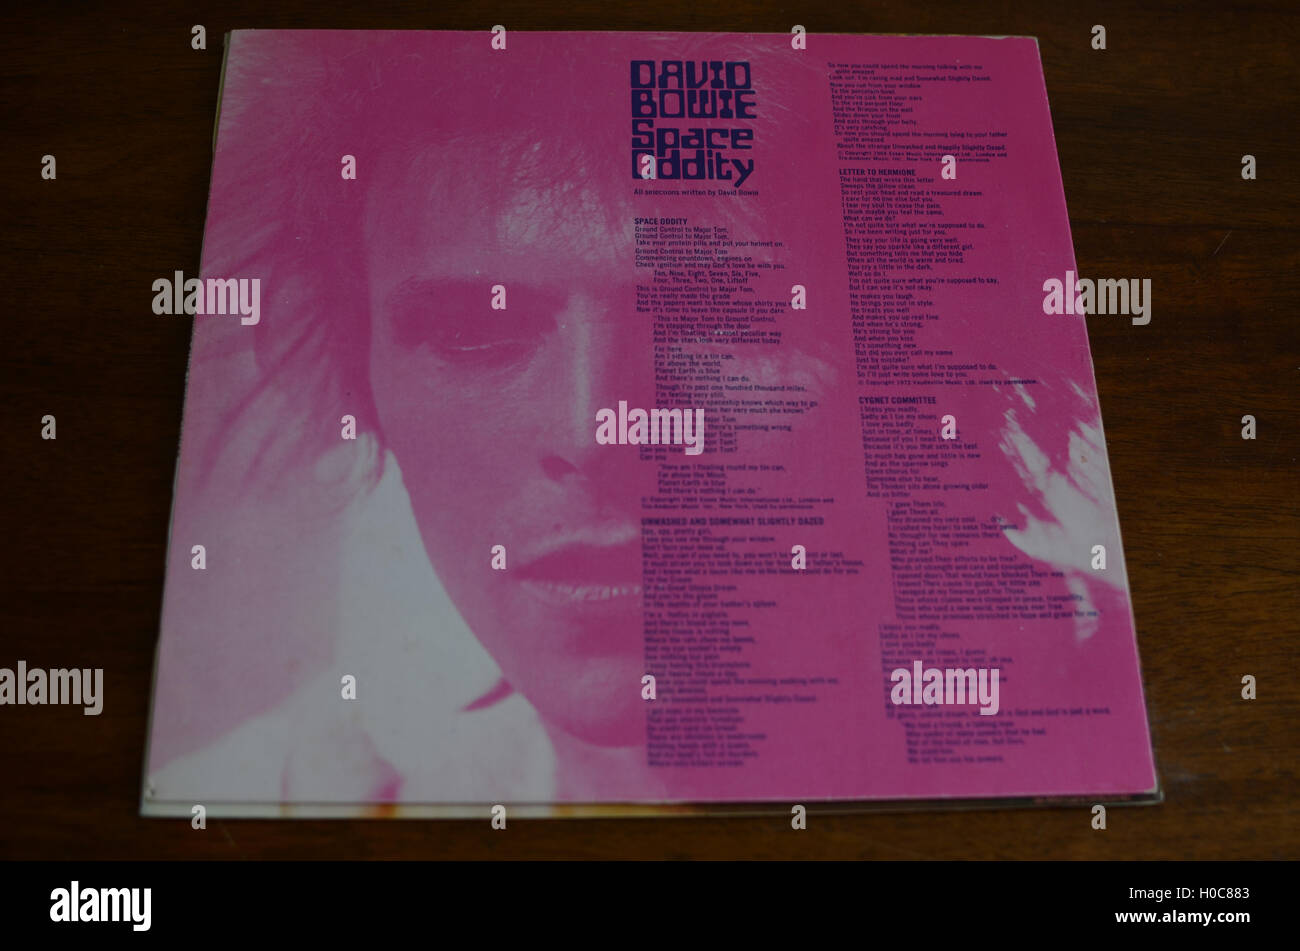 David Bowie, Space Oddity, Spanish Import, inner sleeve, lyric sheet - Stock Image